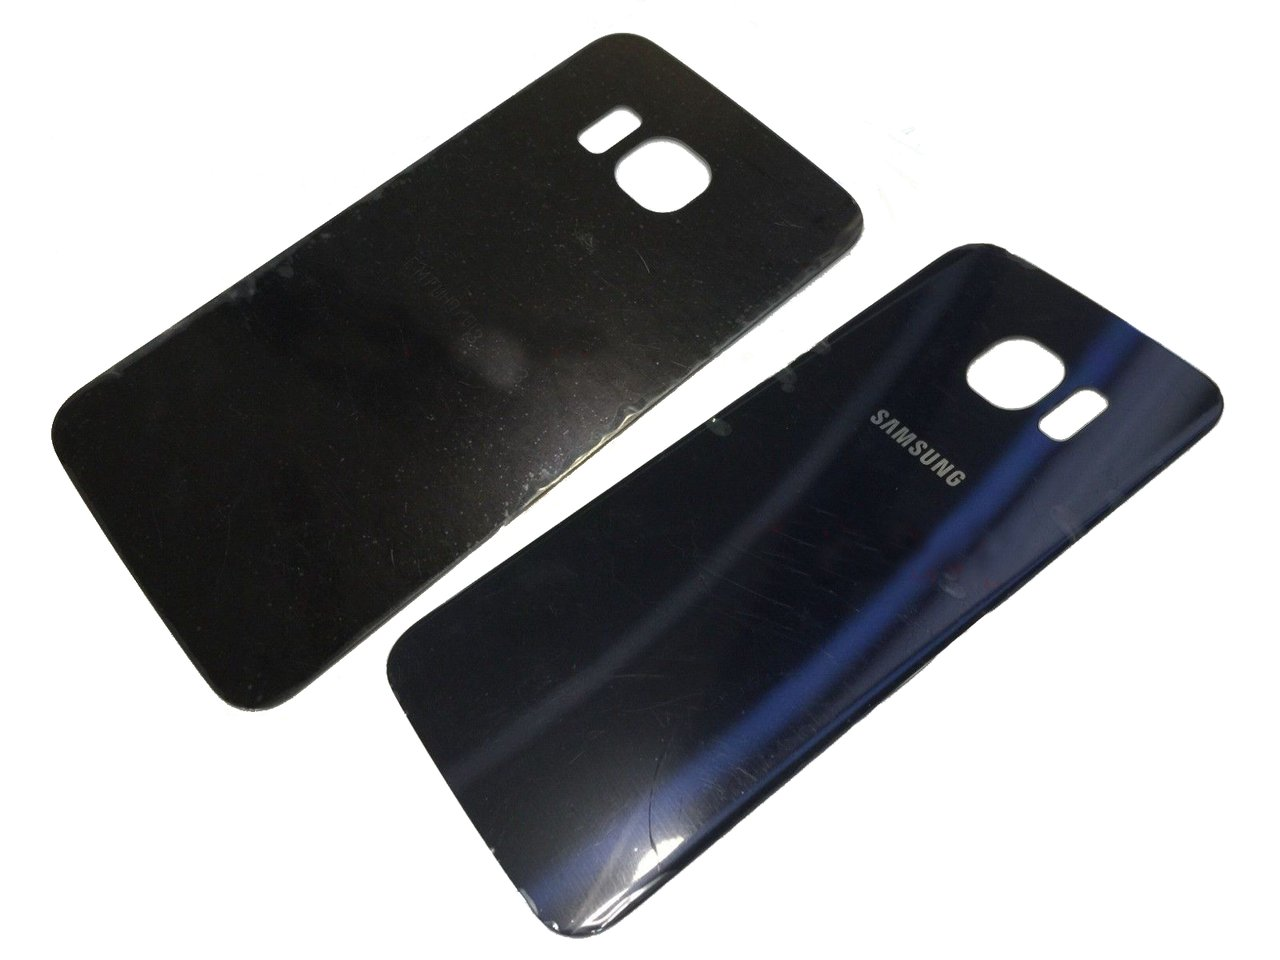 New OEM Samsung Galaxy S6 Edge G925A G925T G925V Back Cover Glass Blue